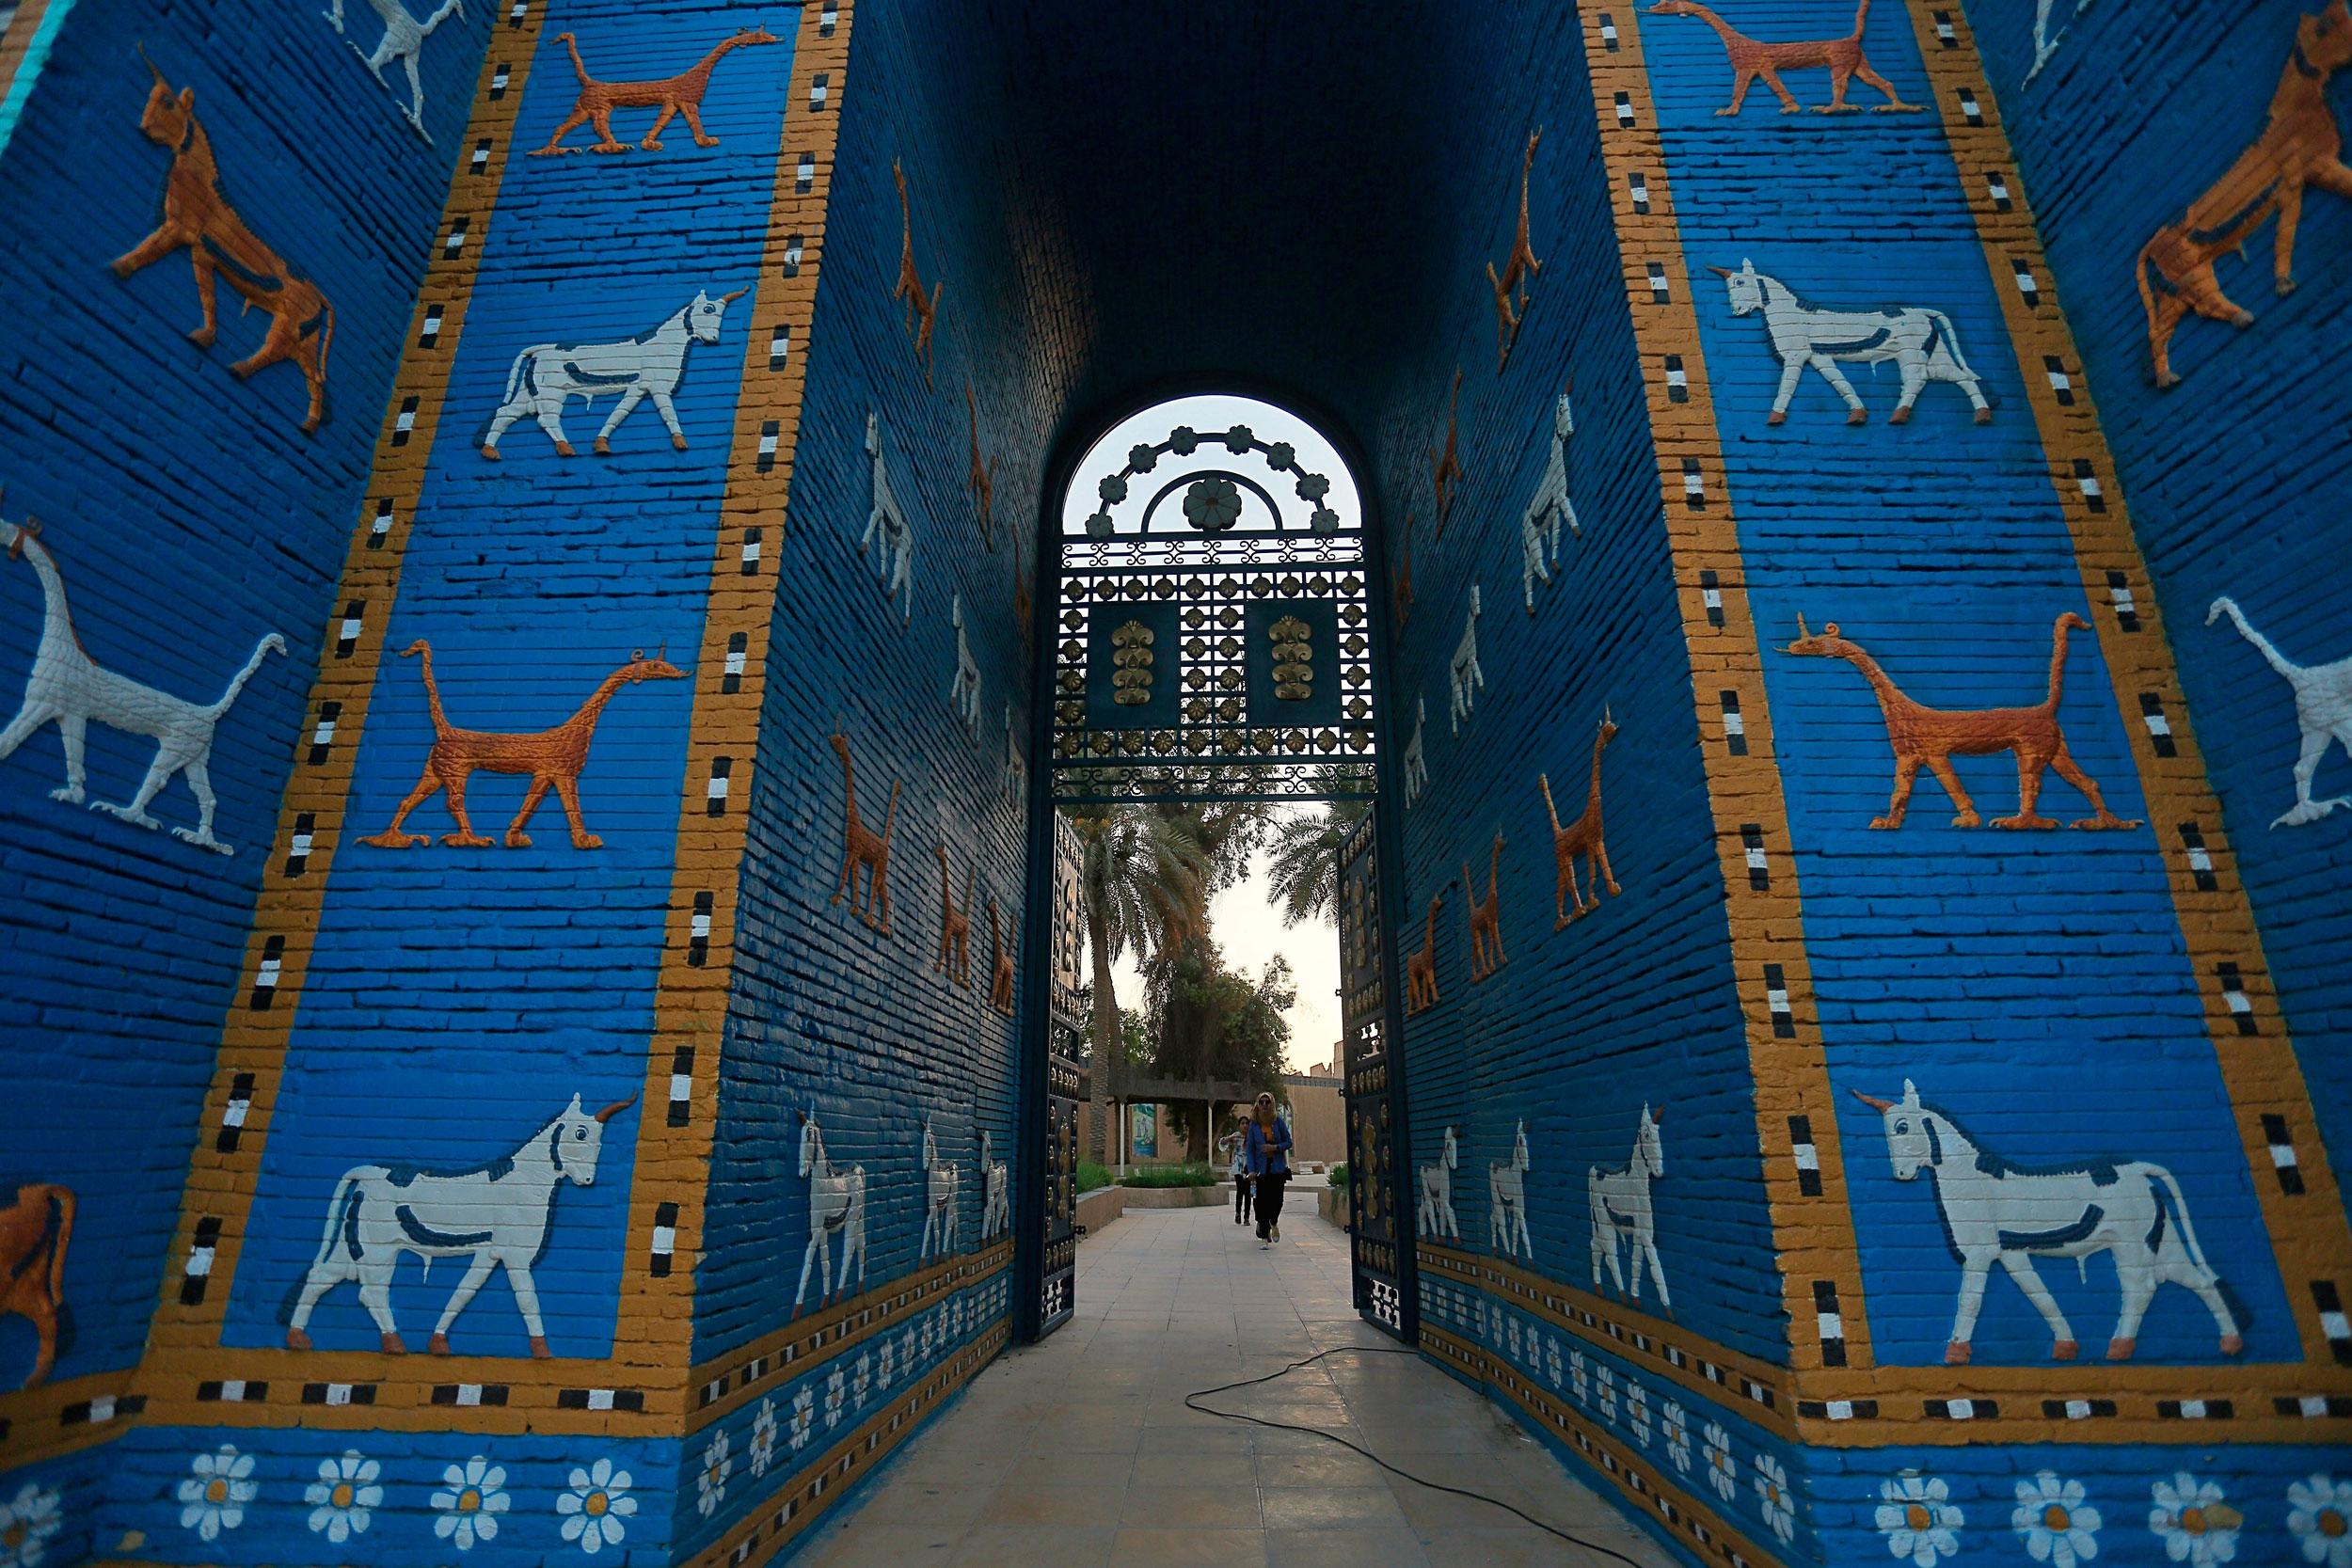 People walk near the Ishtar Gate in the ancient city of Babylon near Hilla, Iraq, on July 5, 2019.